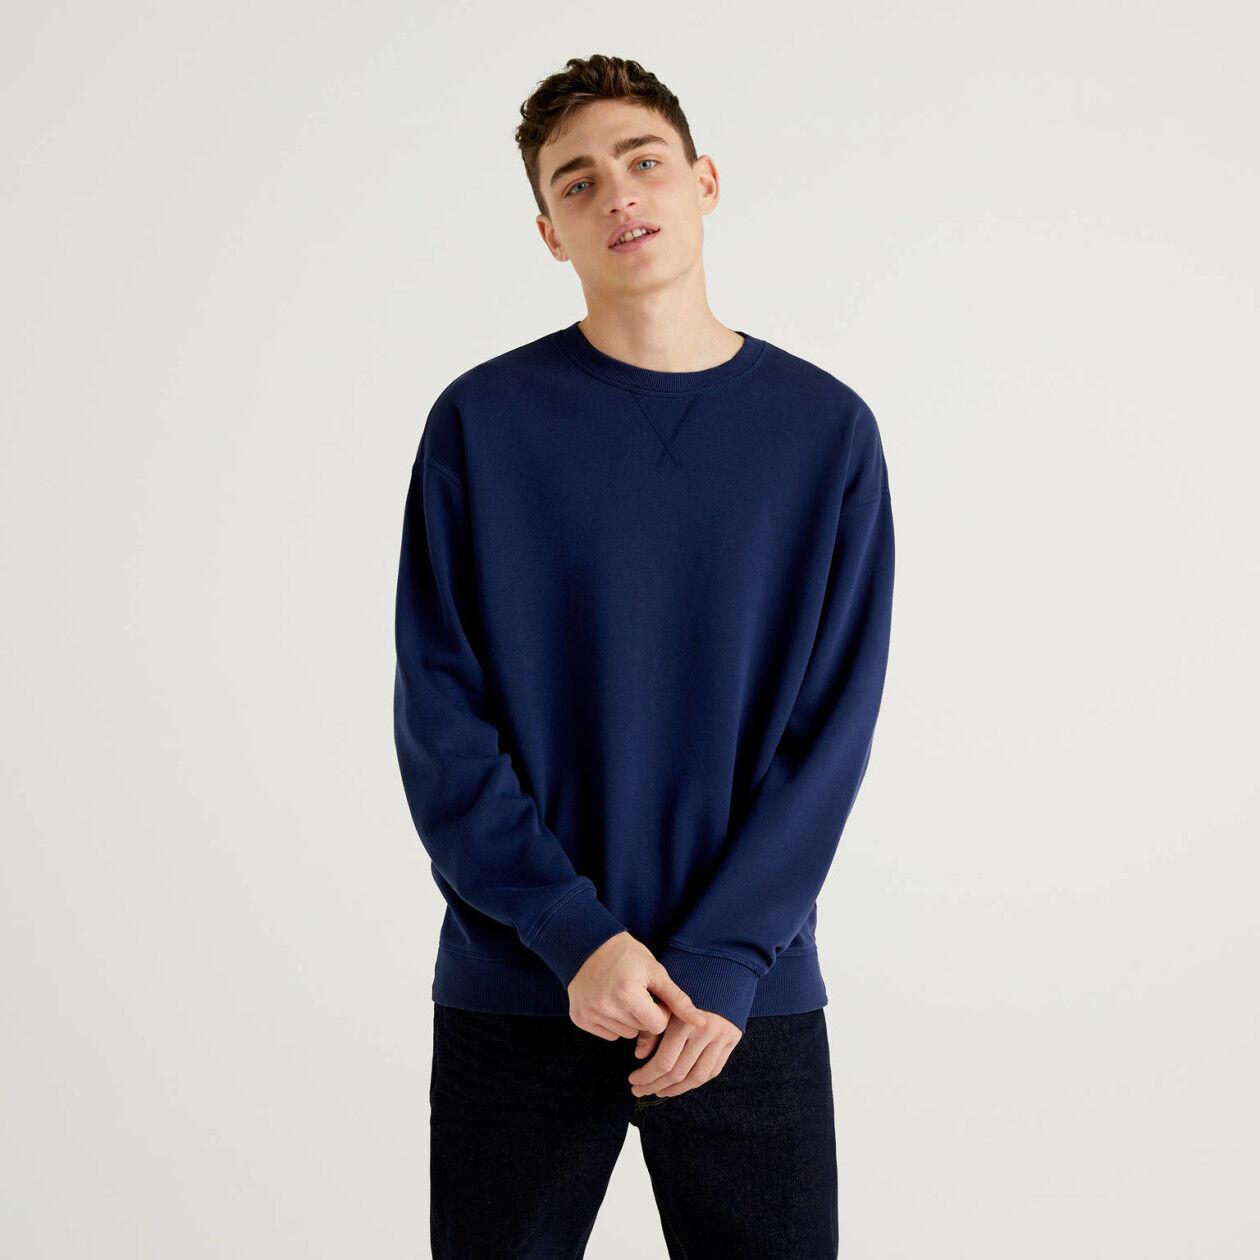 Customizable pure cotton sweatshirt